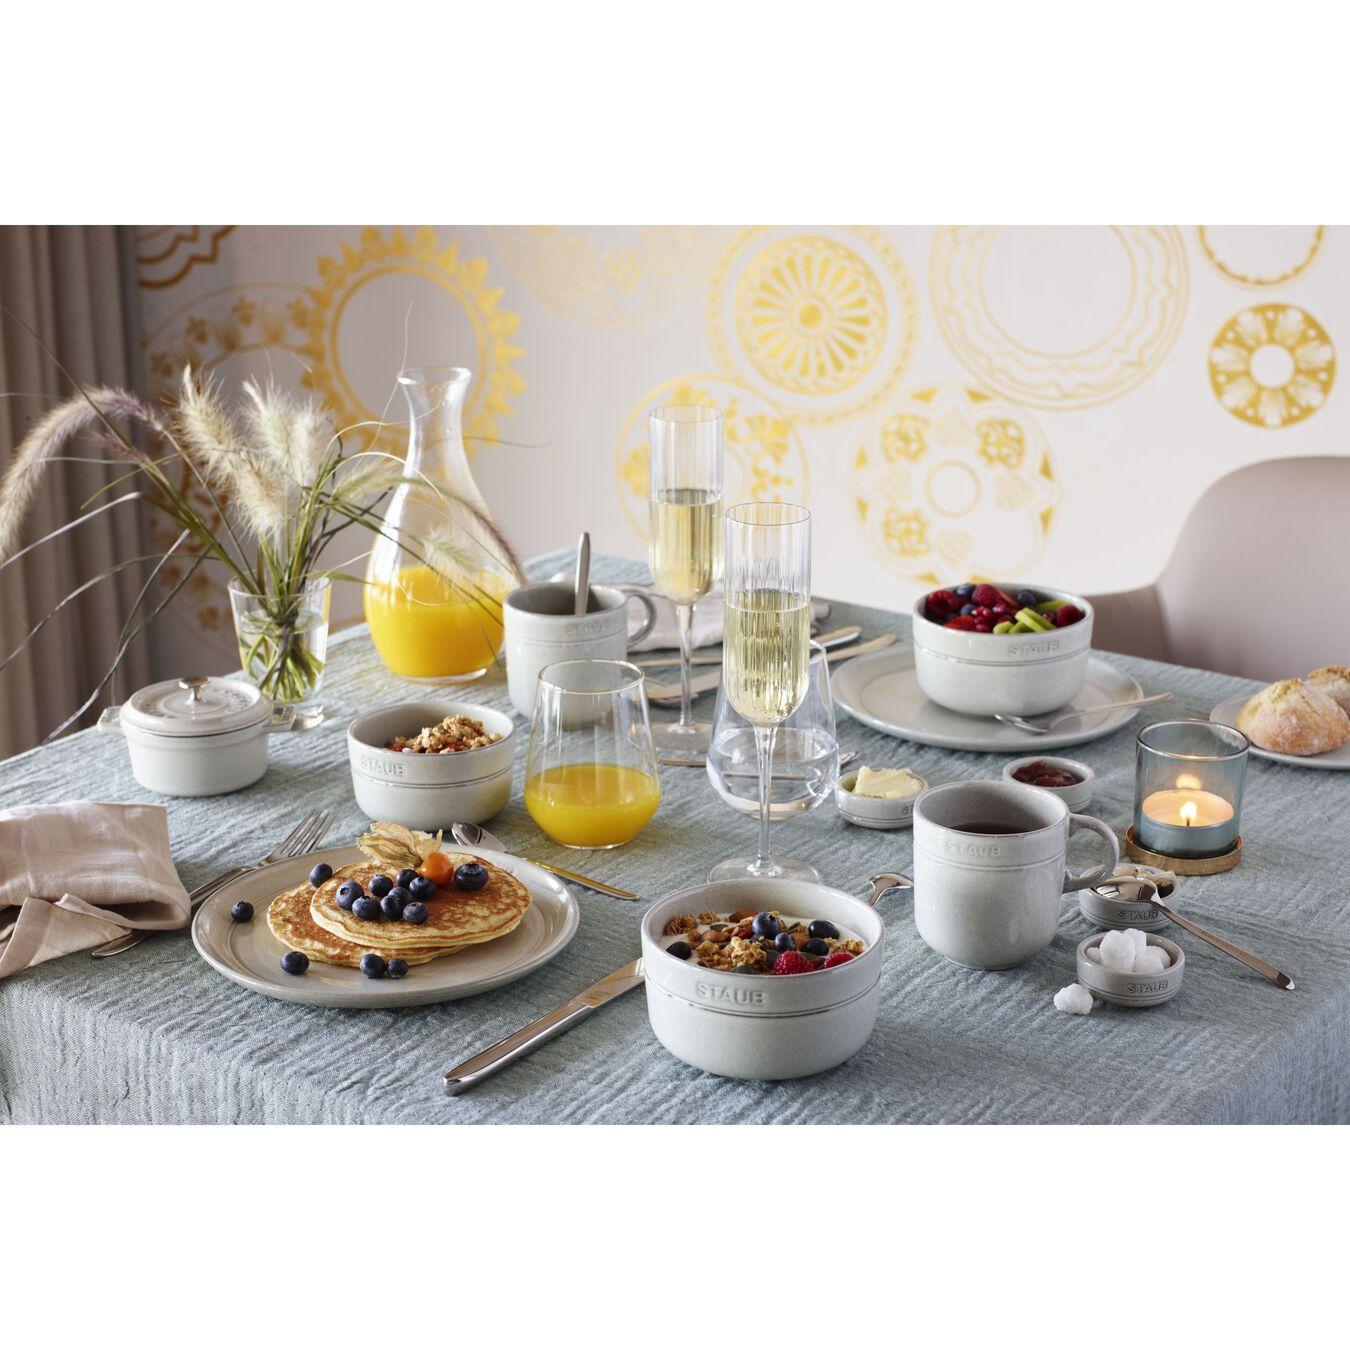 Serving set, 48 Piece | white truffle | ceramic,,large 11